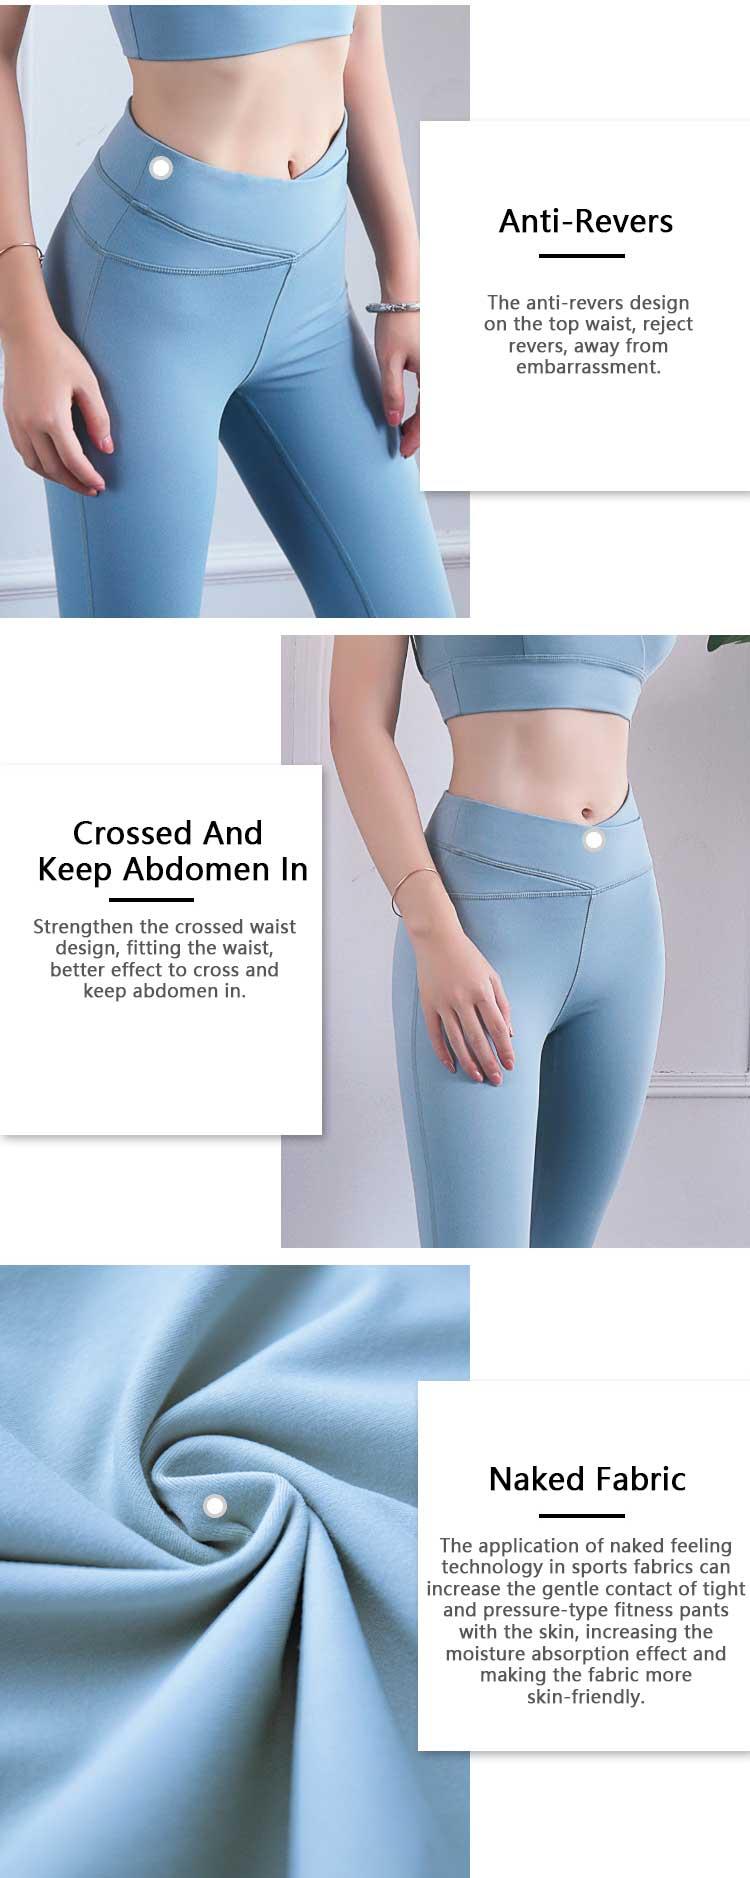 Slimming-yoga-pants-performance-introduction